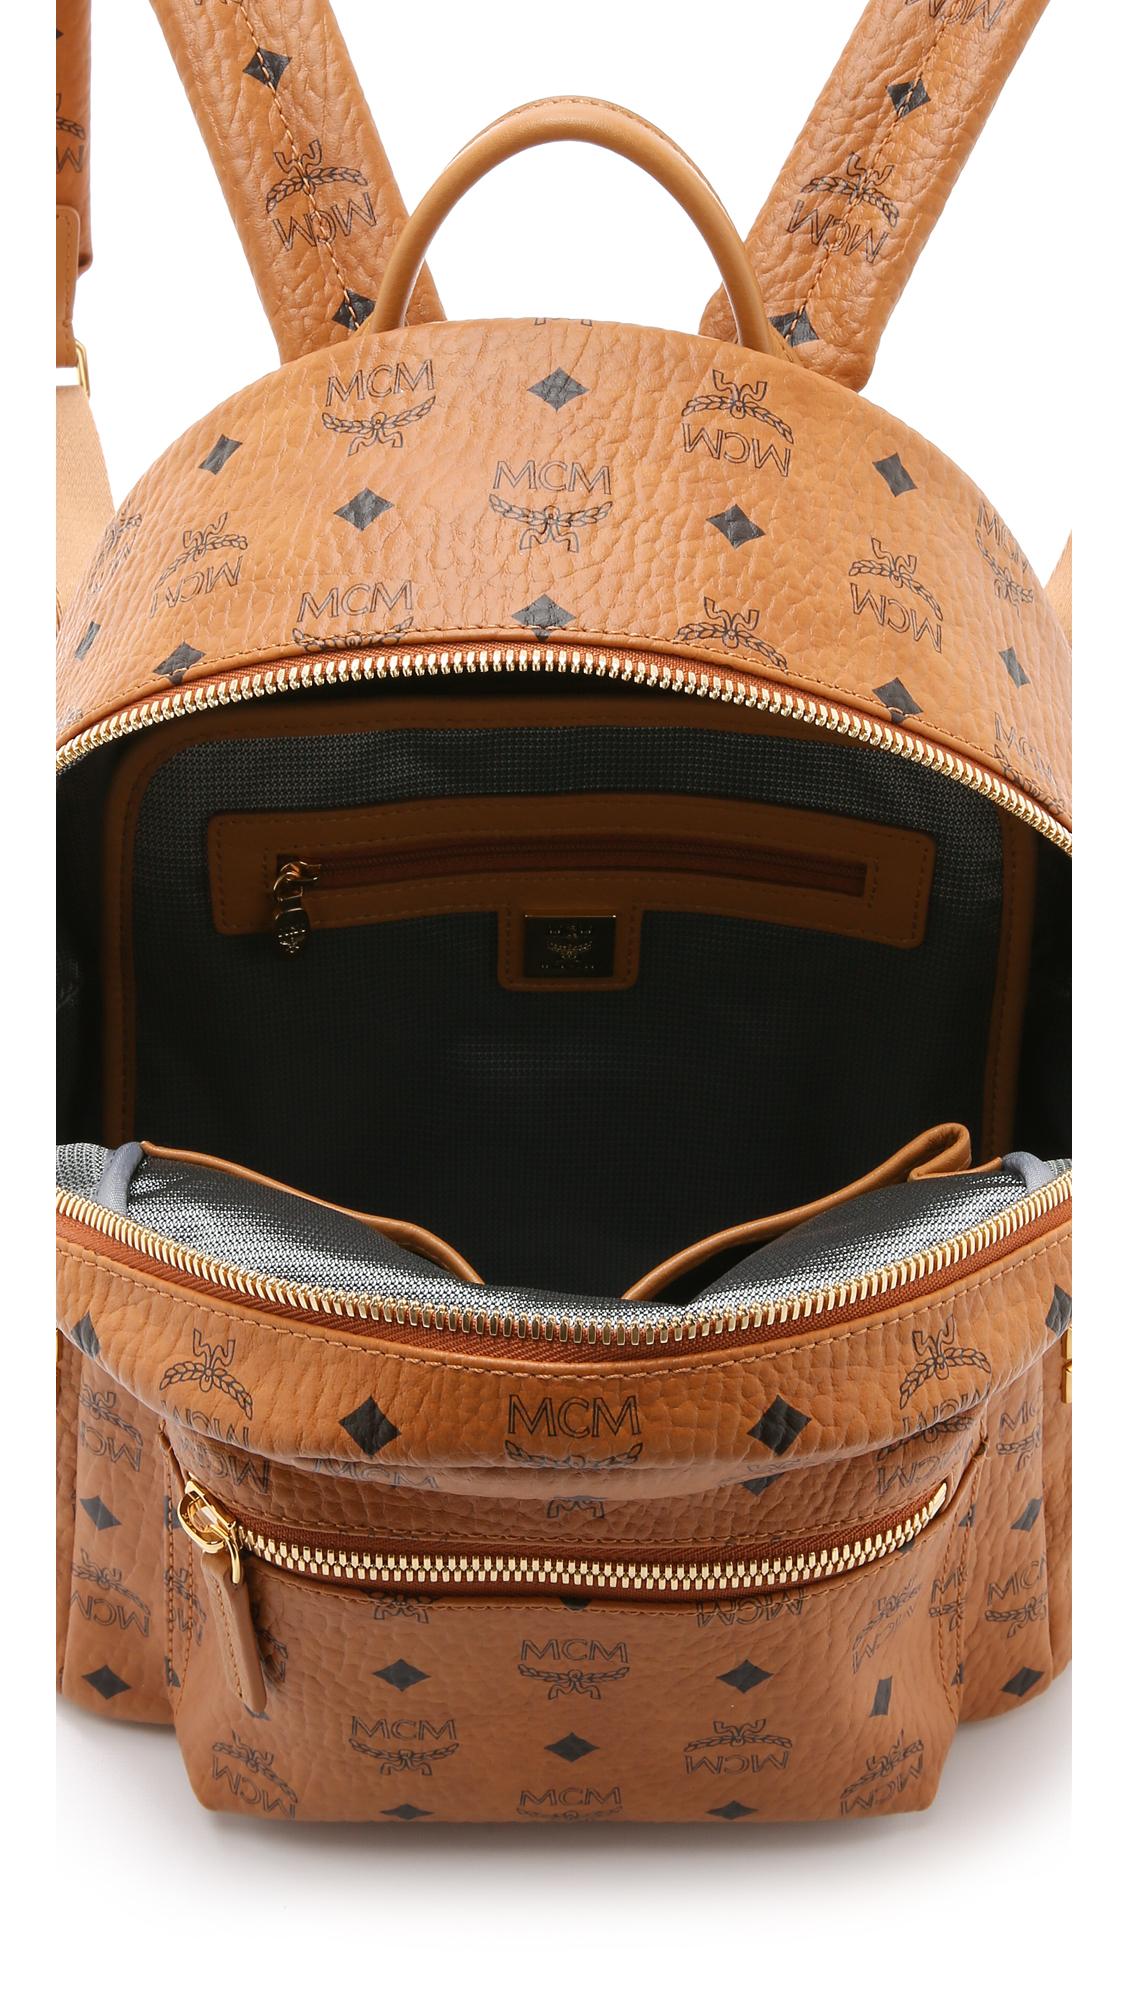 6696b8f536757 Lyst - Mcm Side Stud Small Stark Backpack - Cognac in Brown